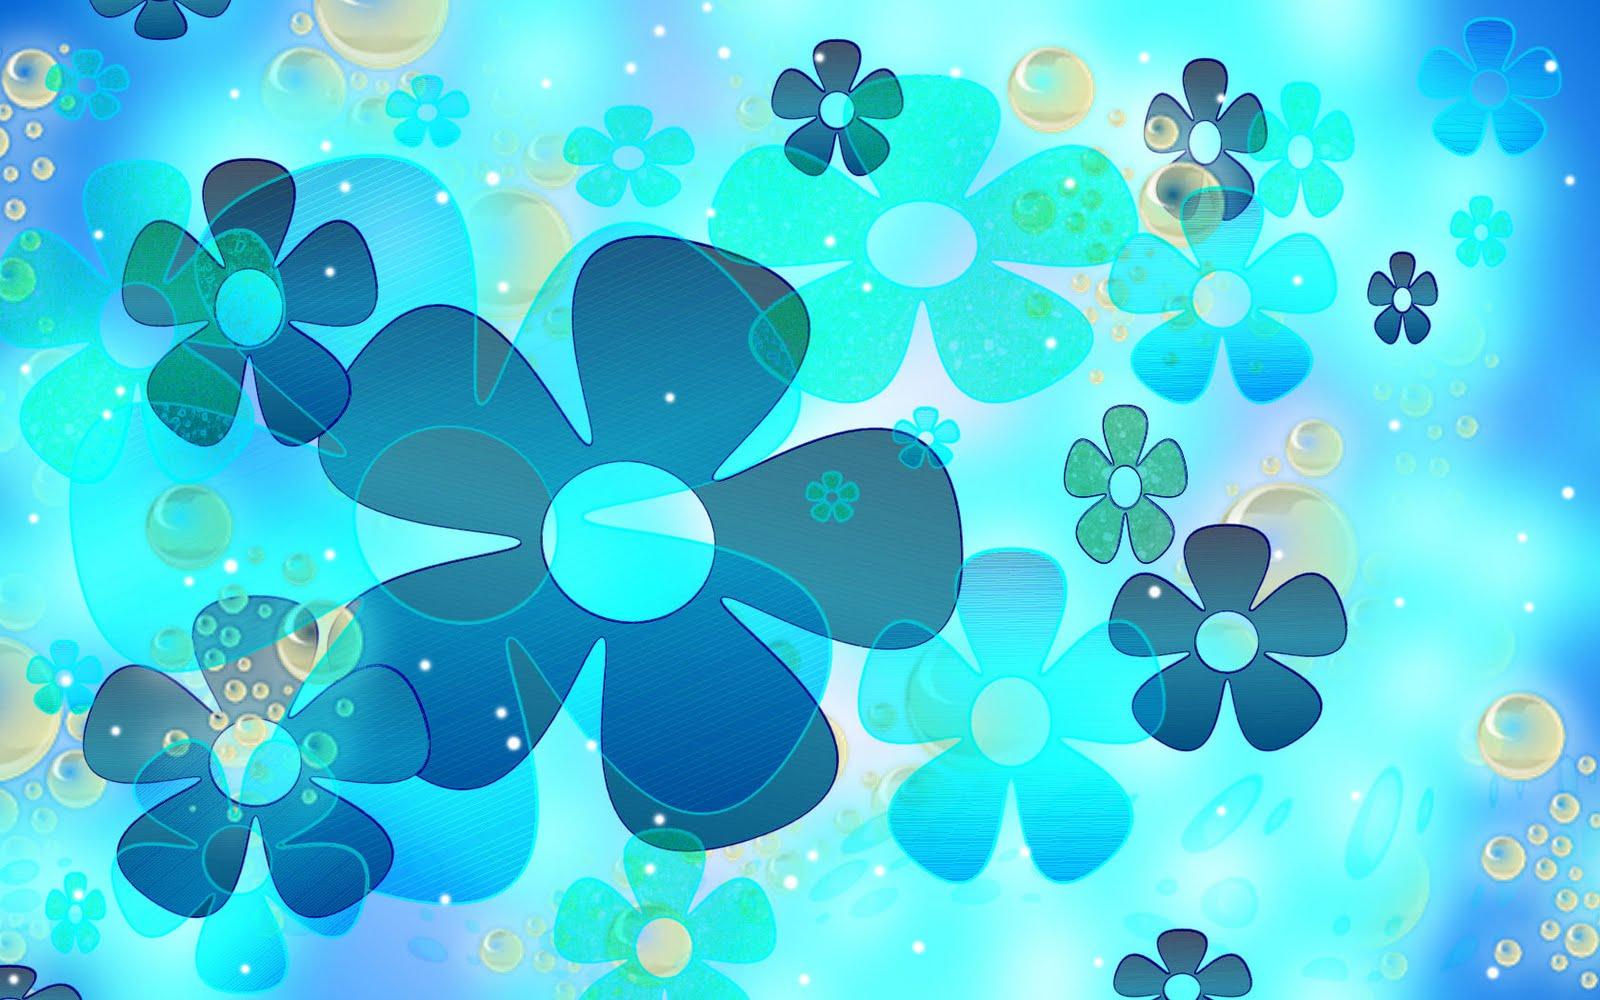 blue flowers wallpaper blue flowers wallpaper blue flowers wallpaper 1600x1000